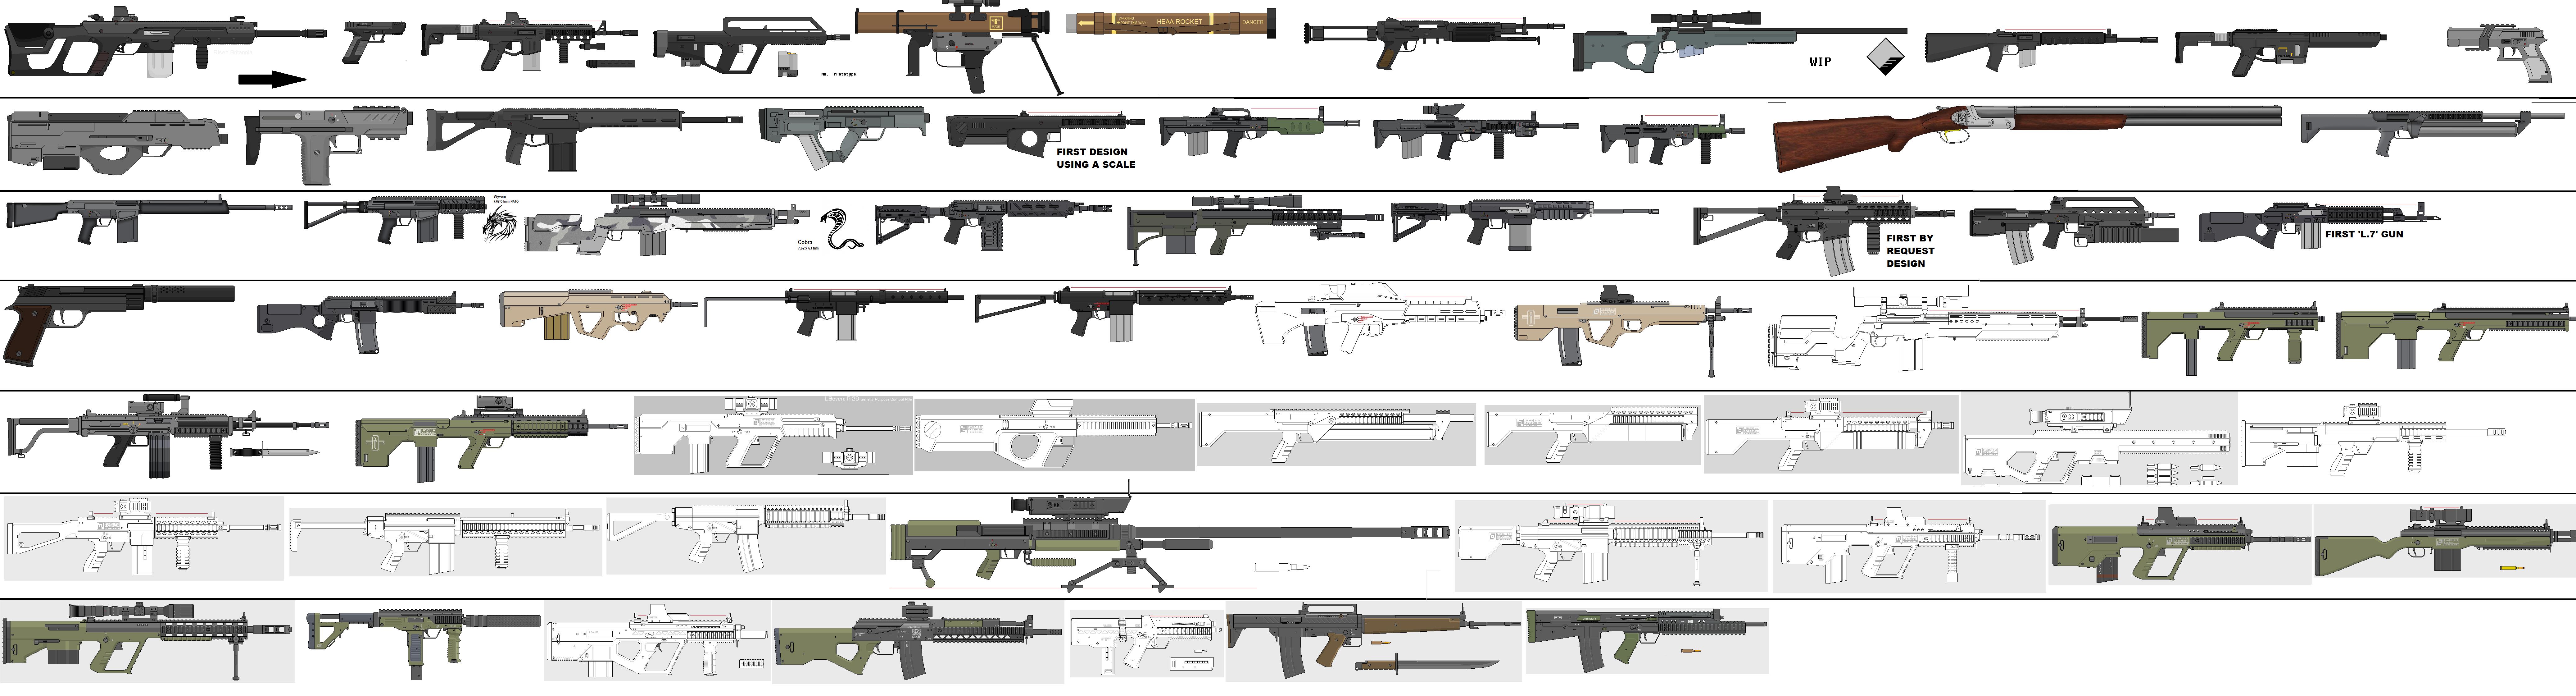 Lineart Timeline Weapons Mb Deviantart